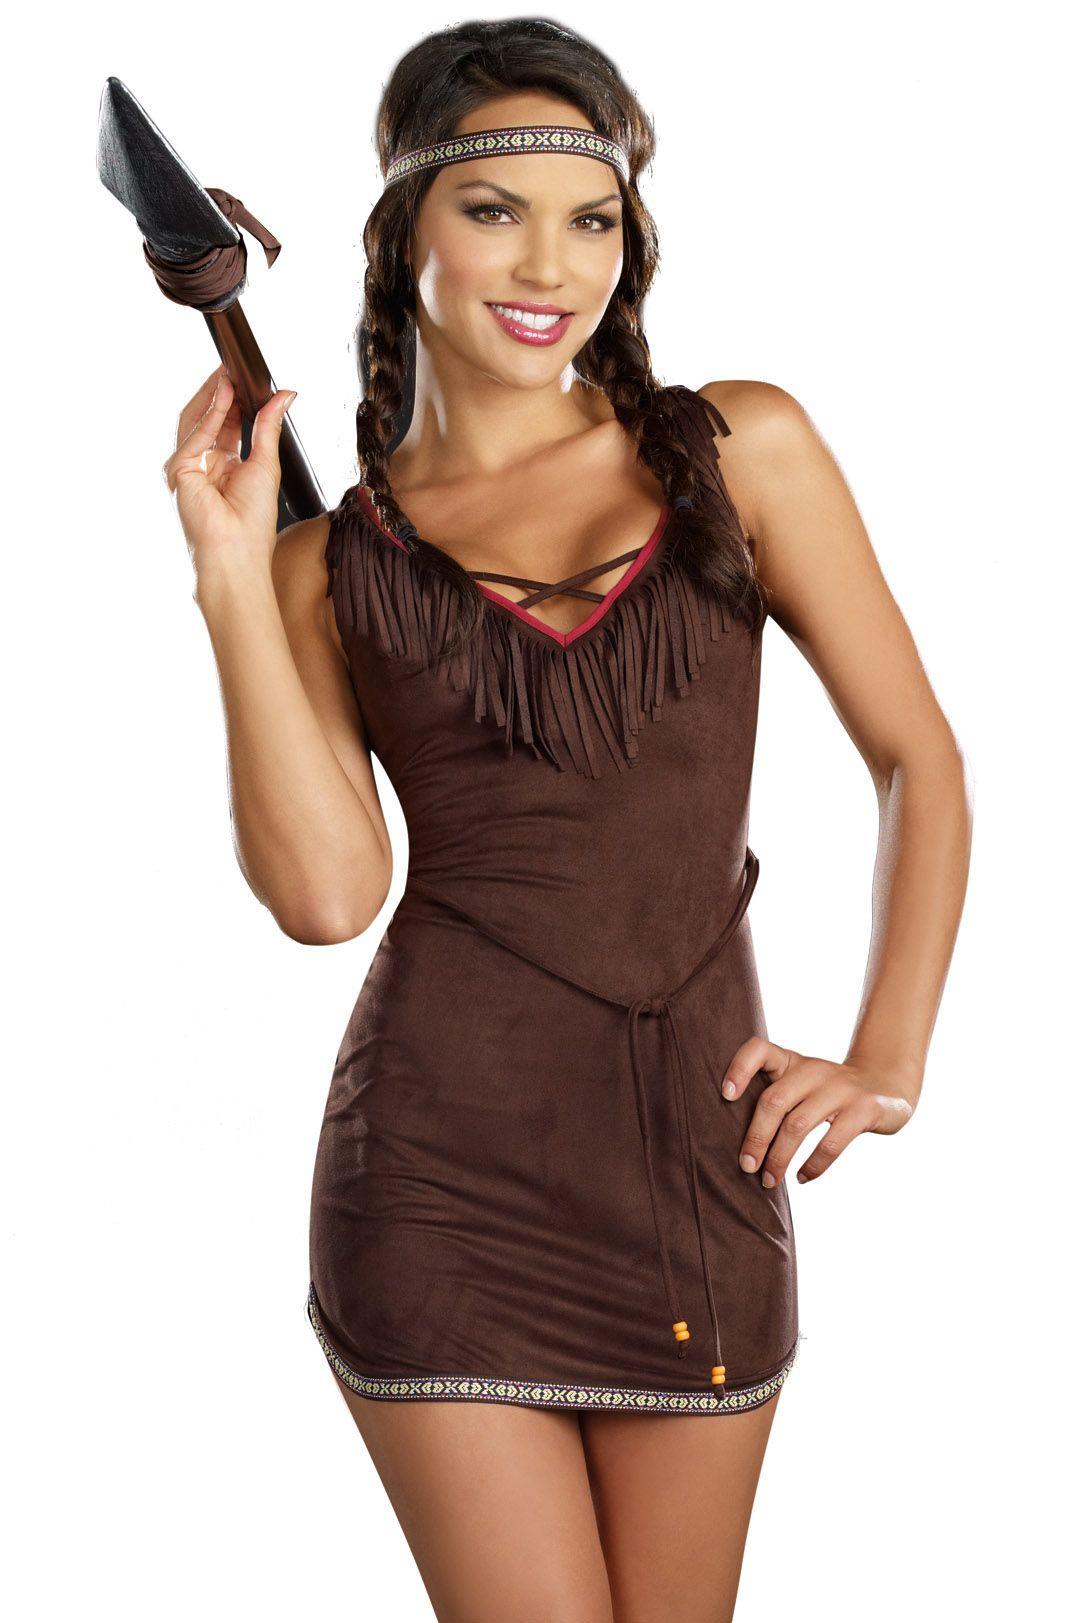 d937e7e6023 Native Beauty Costume #lingeriediva | Women's Halloween Costumes ...